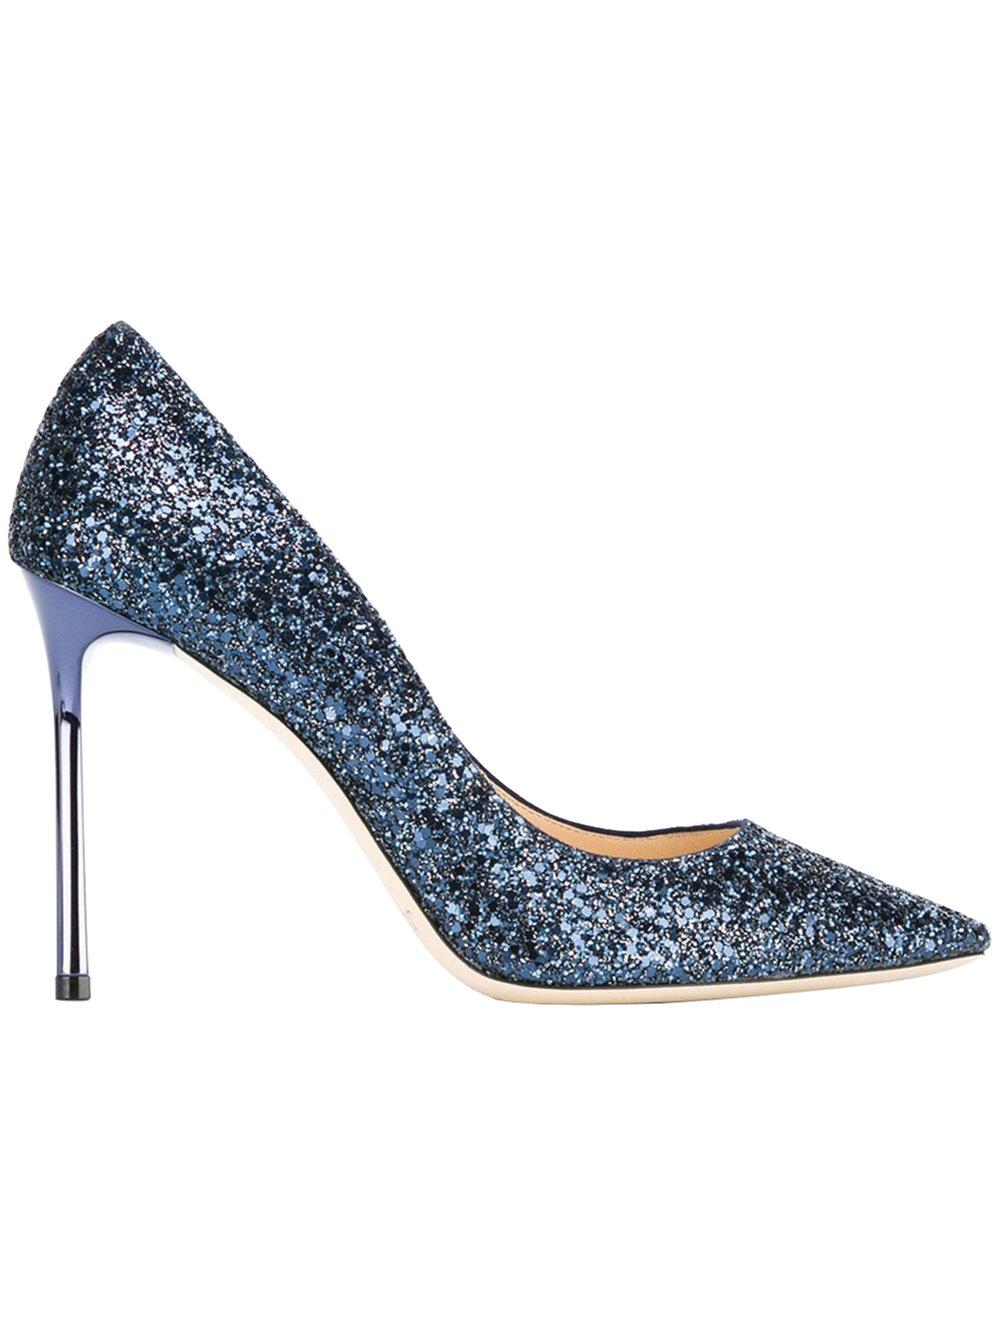 5.Jimmy Choo 高跟鞋 $872,  farfetch.ca